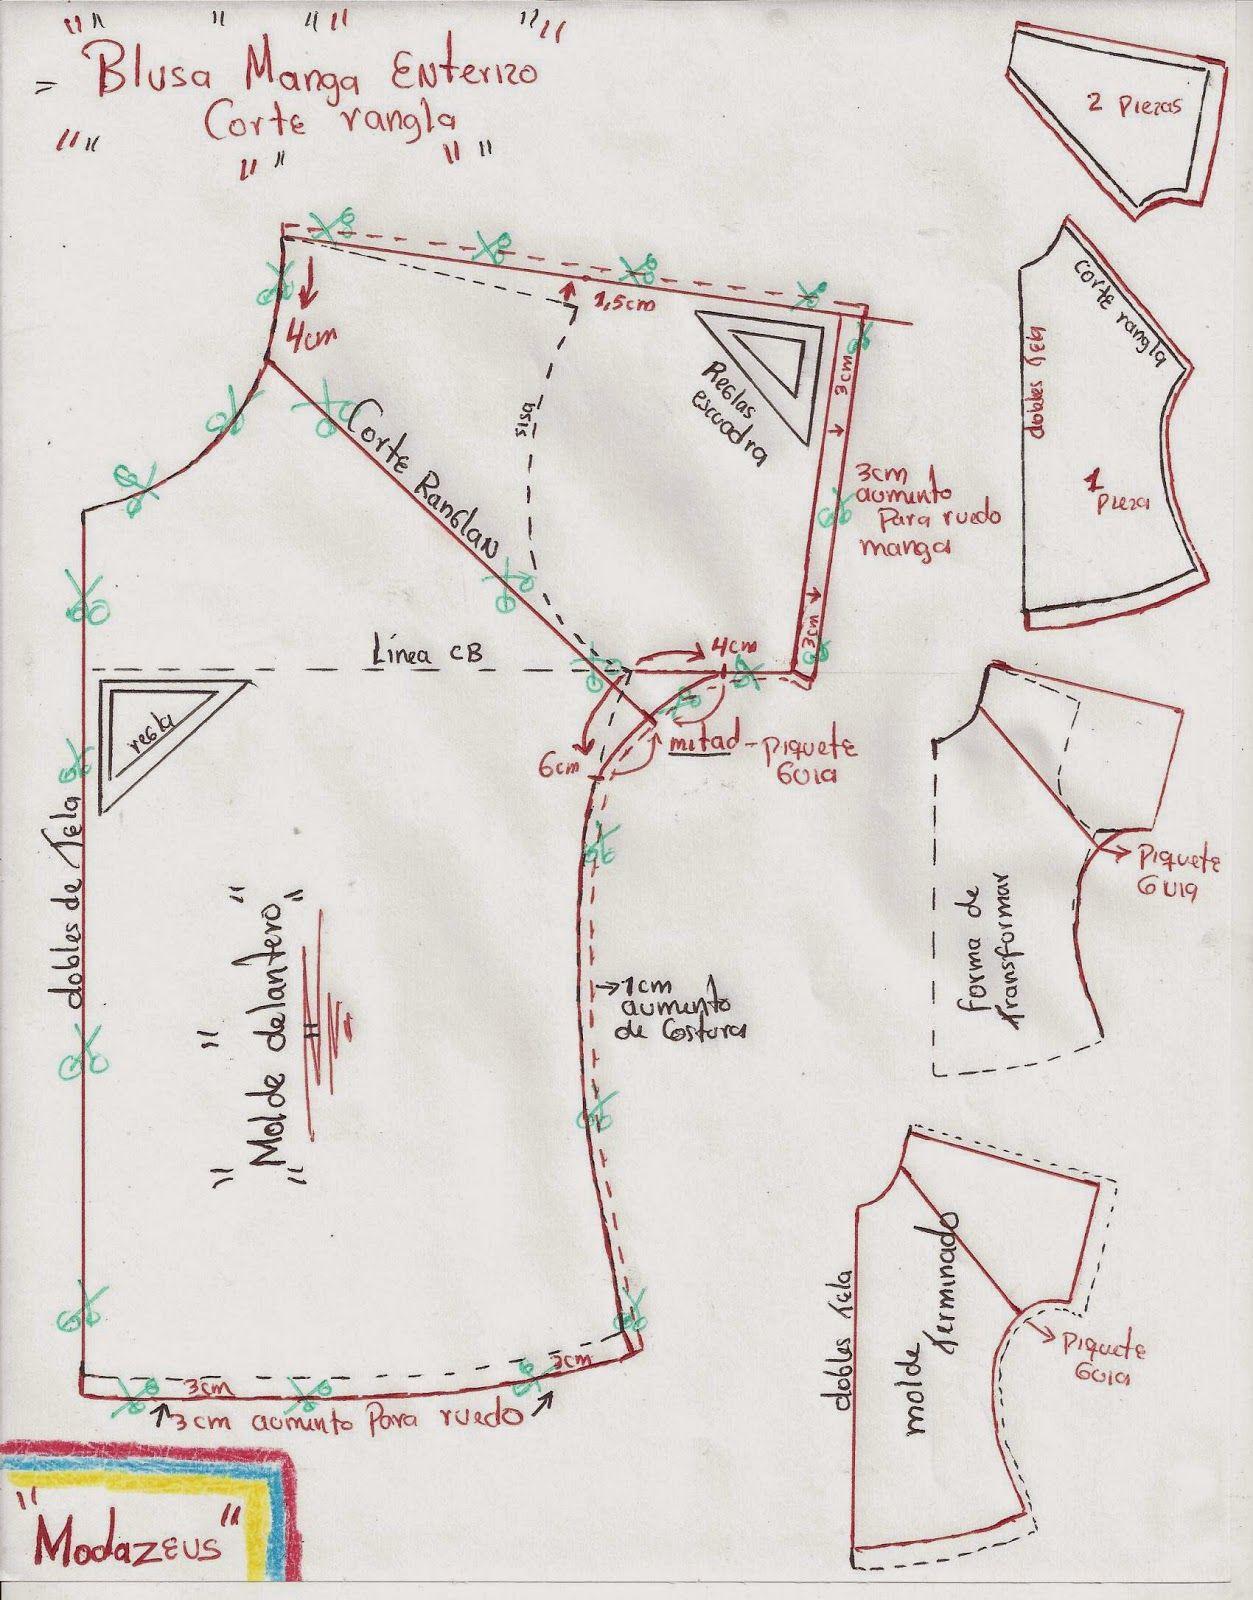 patron de blusa corte ranglan | COSTURA